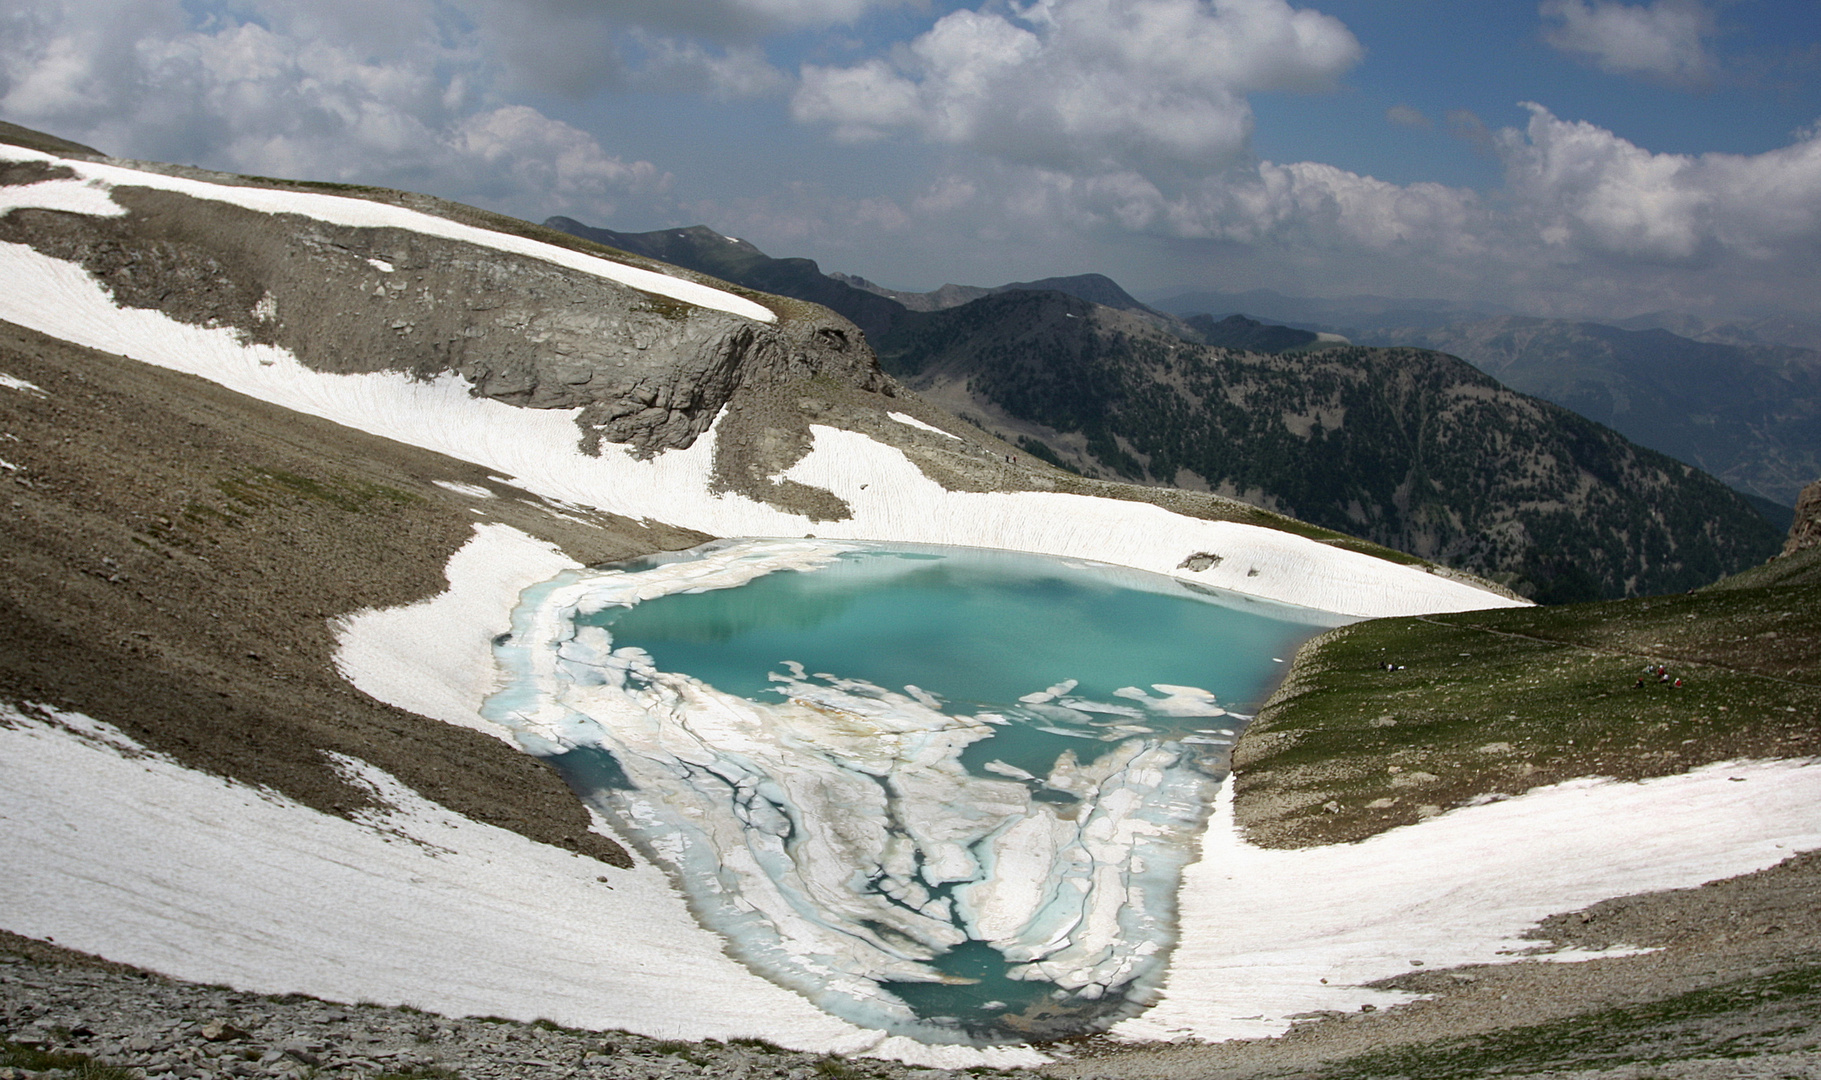 Le lac turquoise (2)